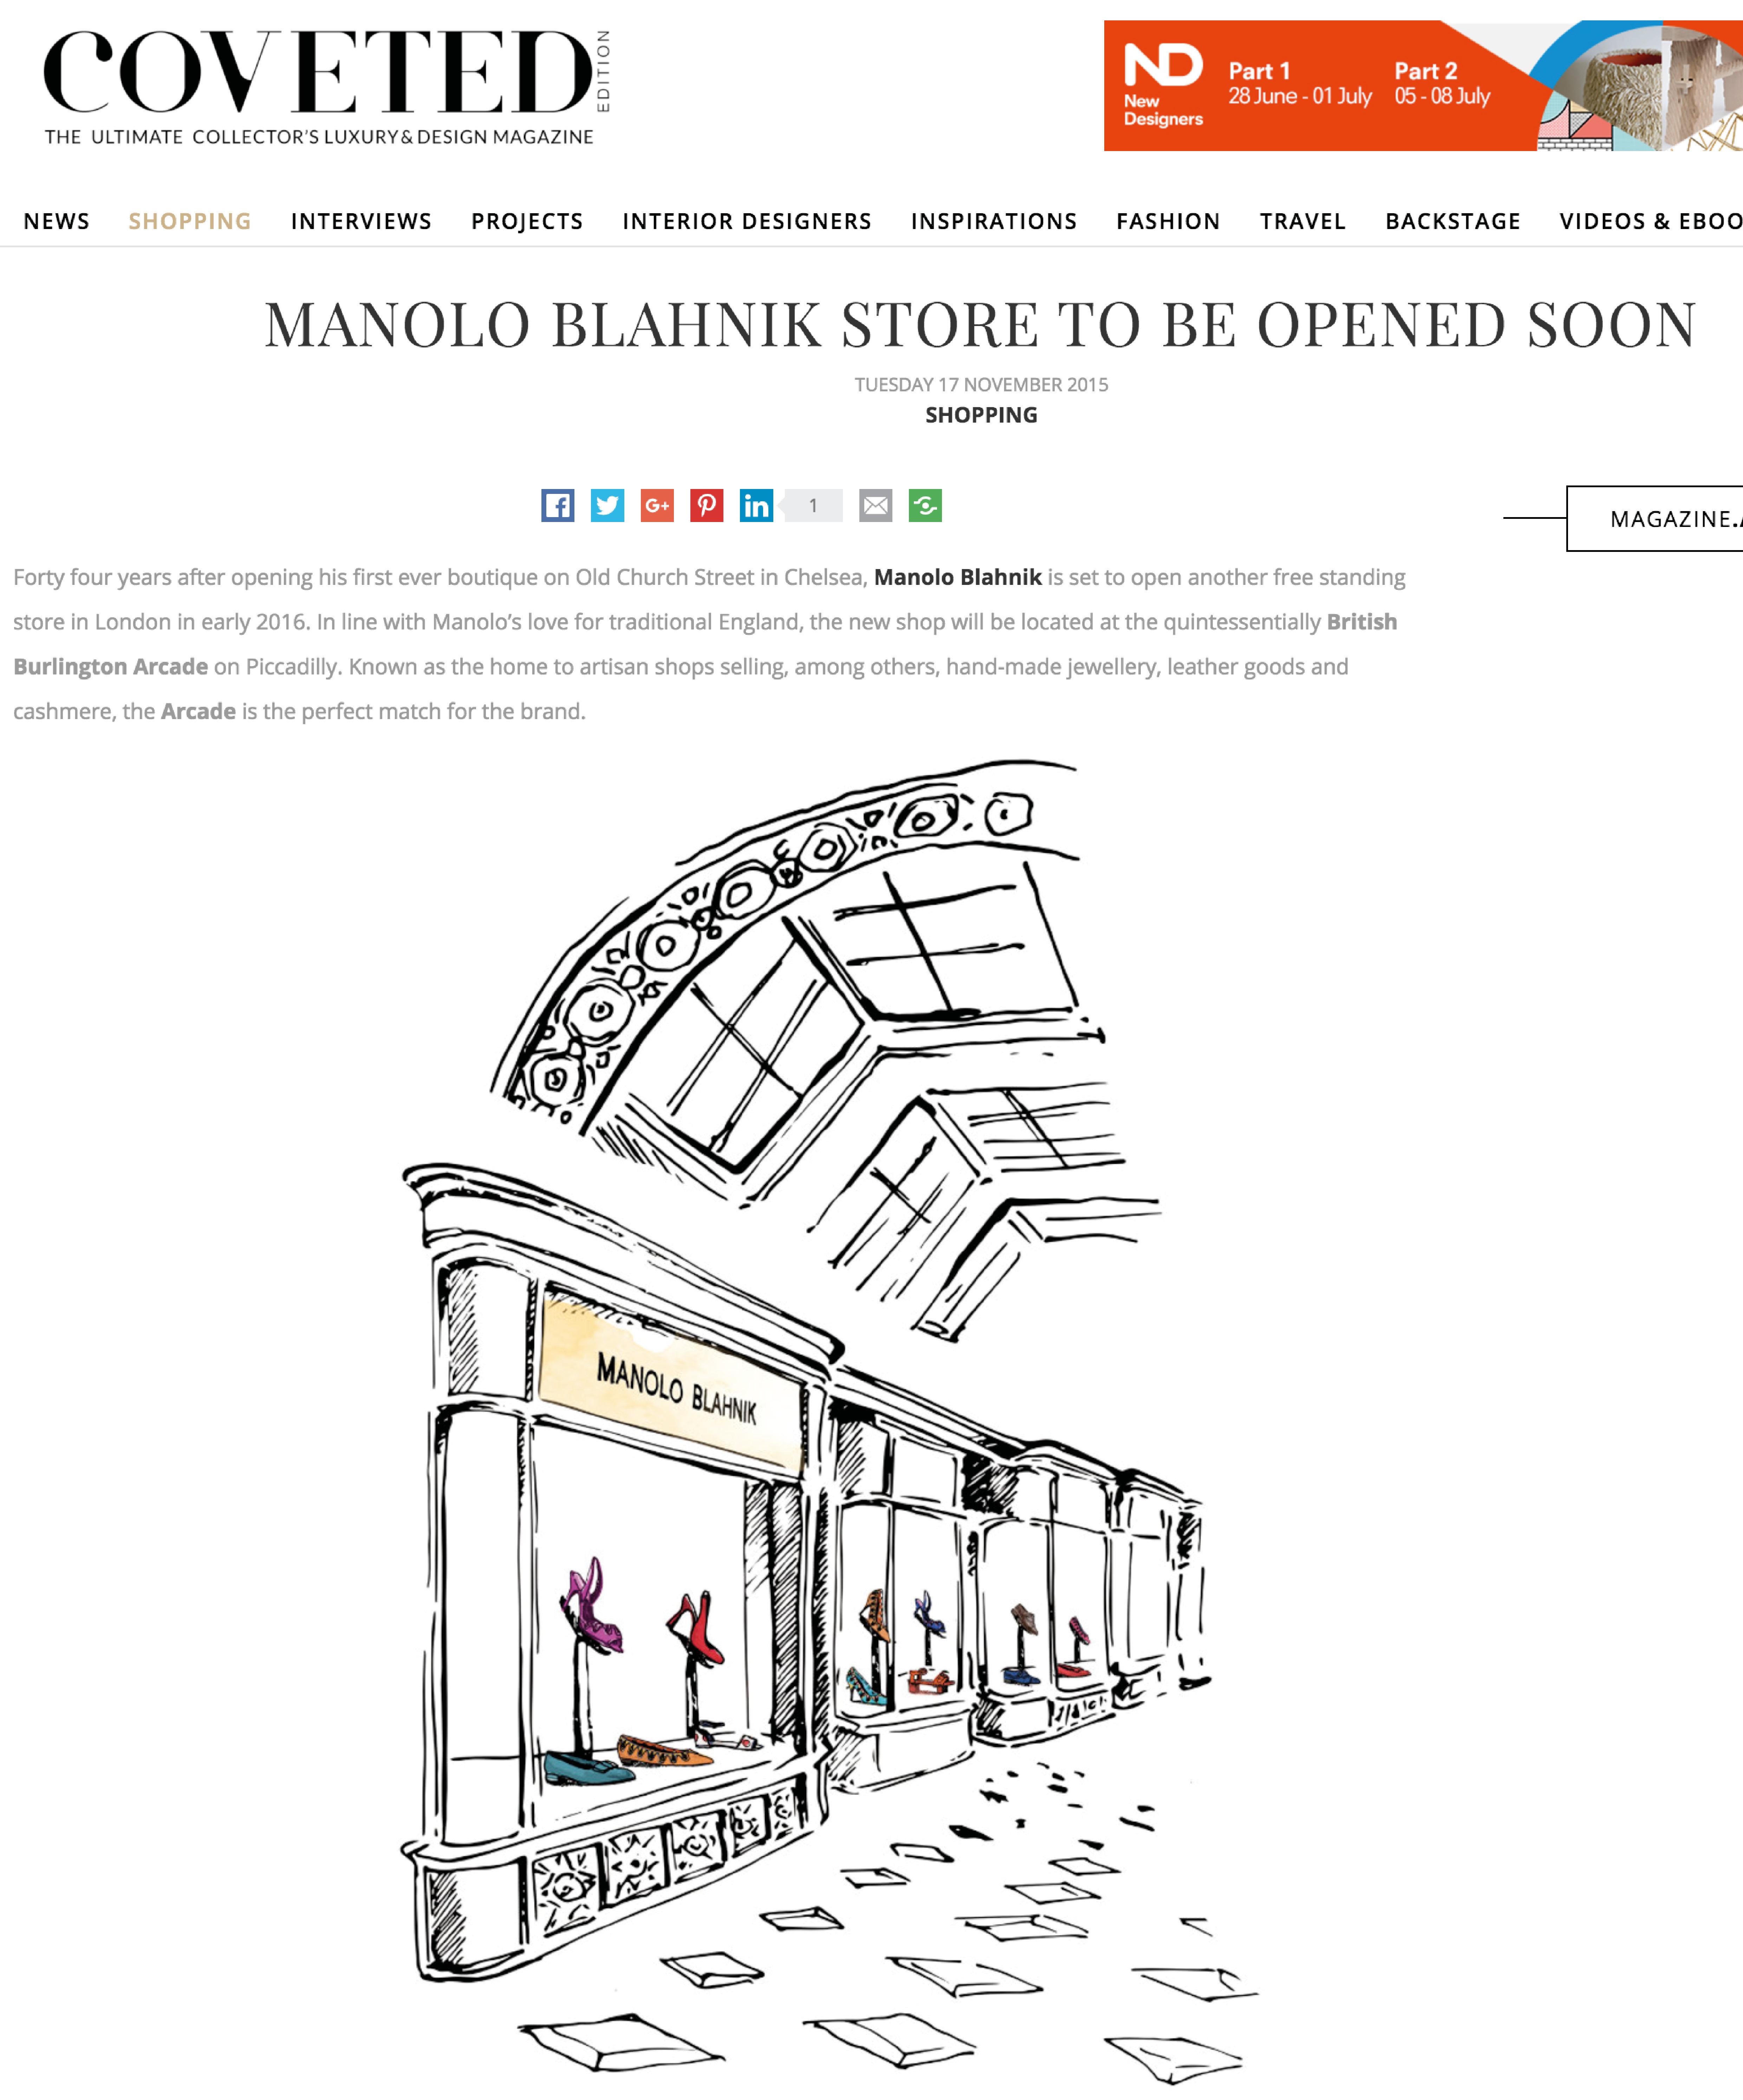 Manolo Blahnik Store opening soon